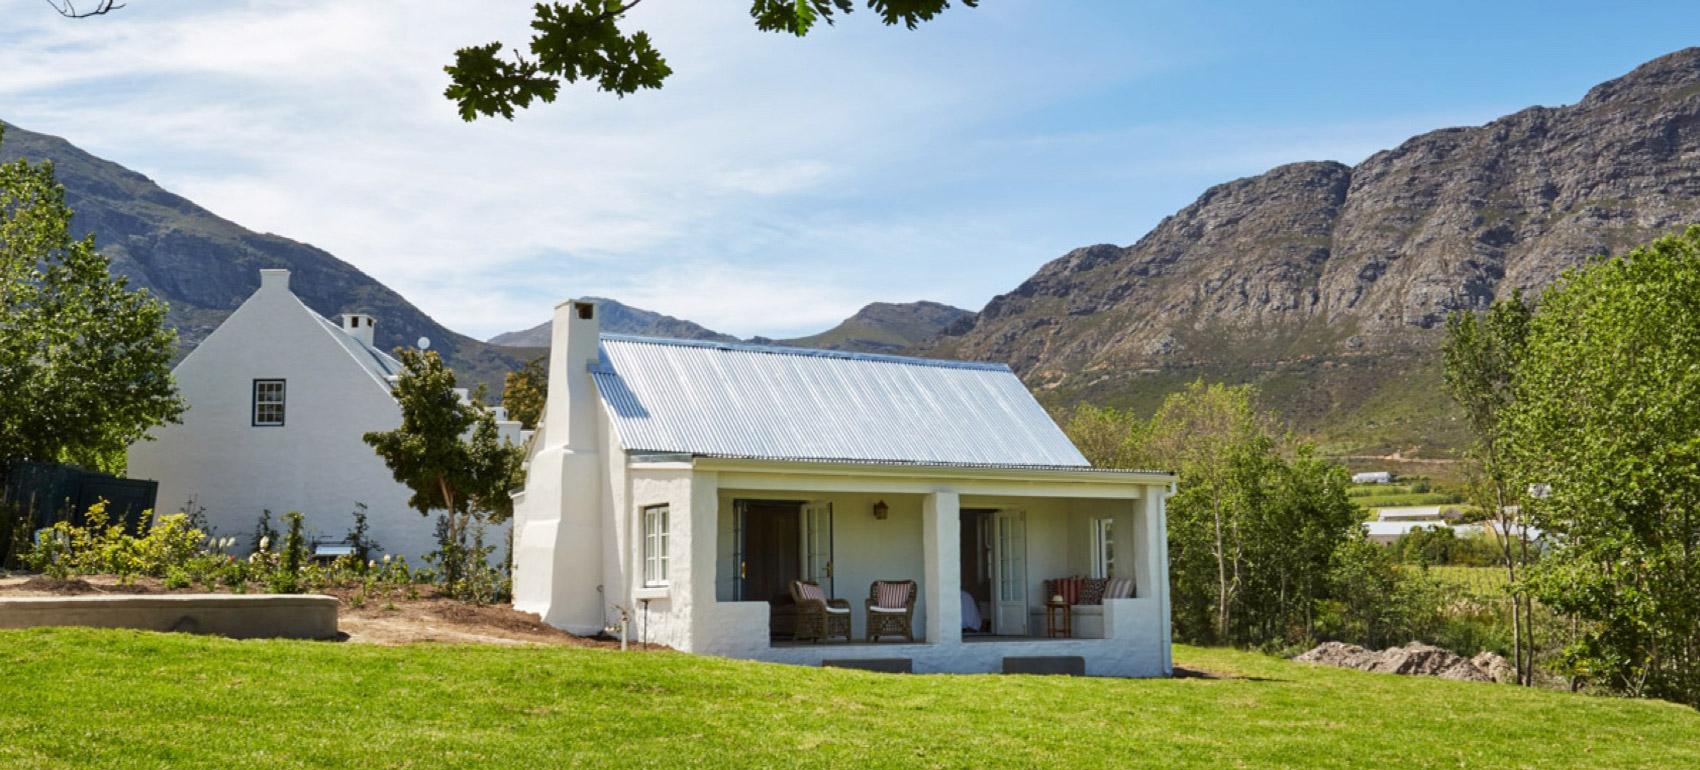 honeymoon-cottage-gallery-08